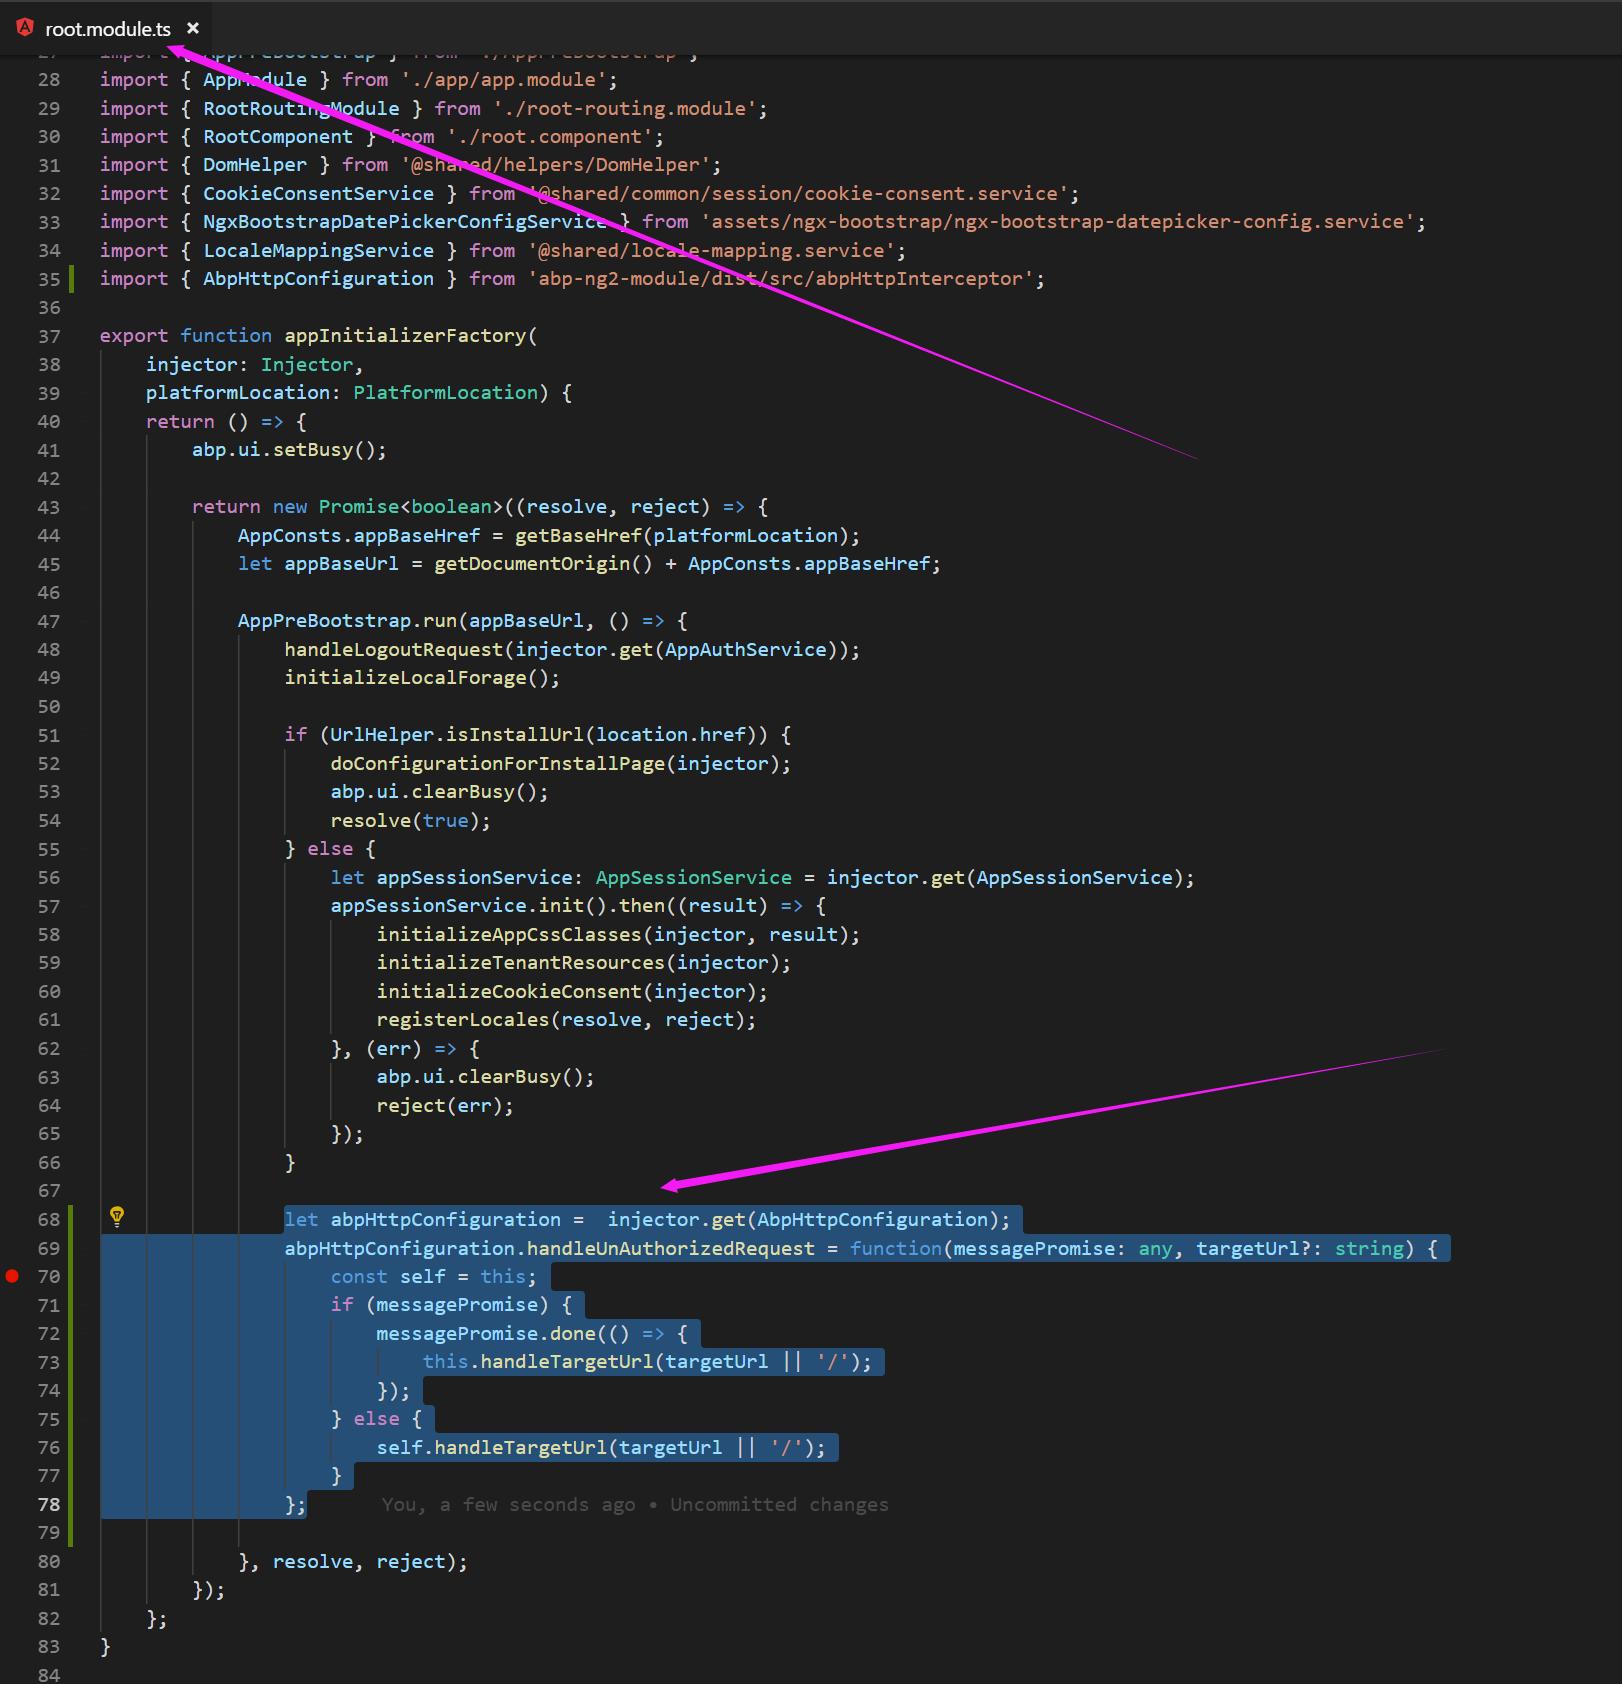 Angular 6: Override @abp/abpHttpConfiguration